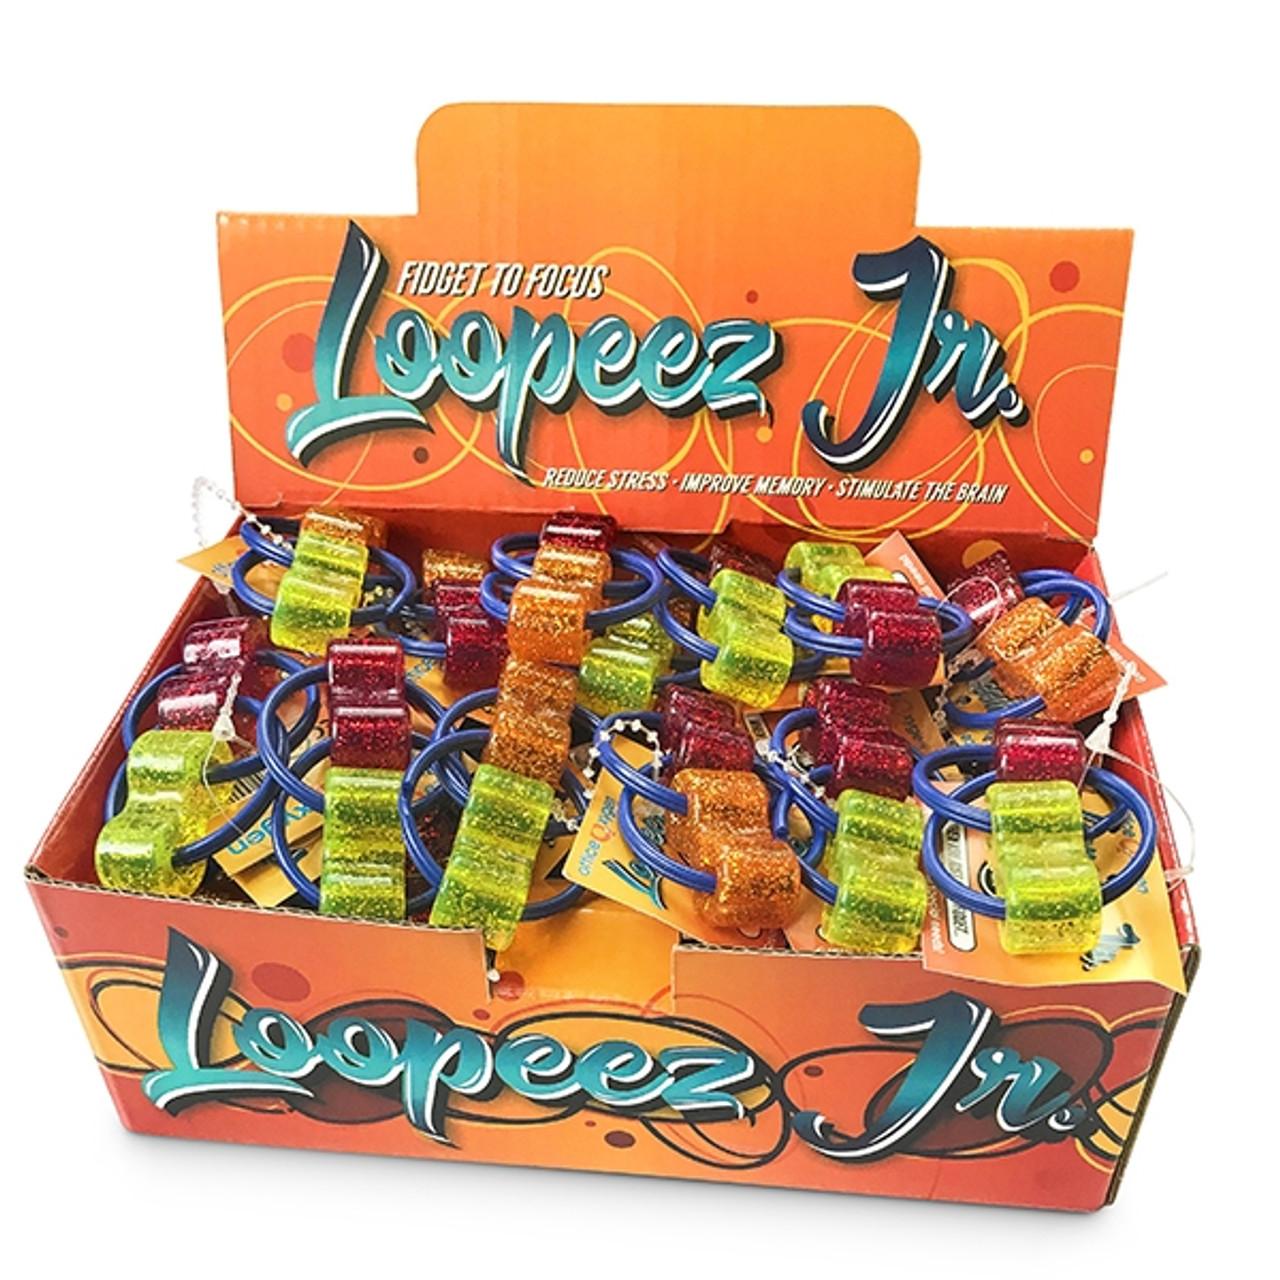 Loopeez Jr